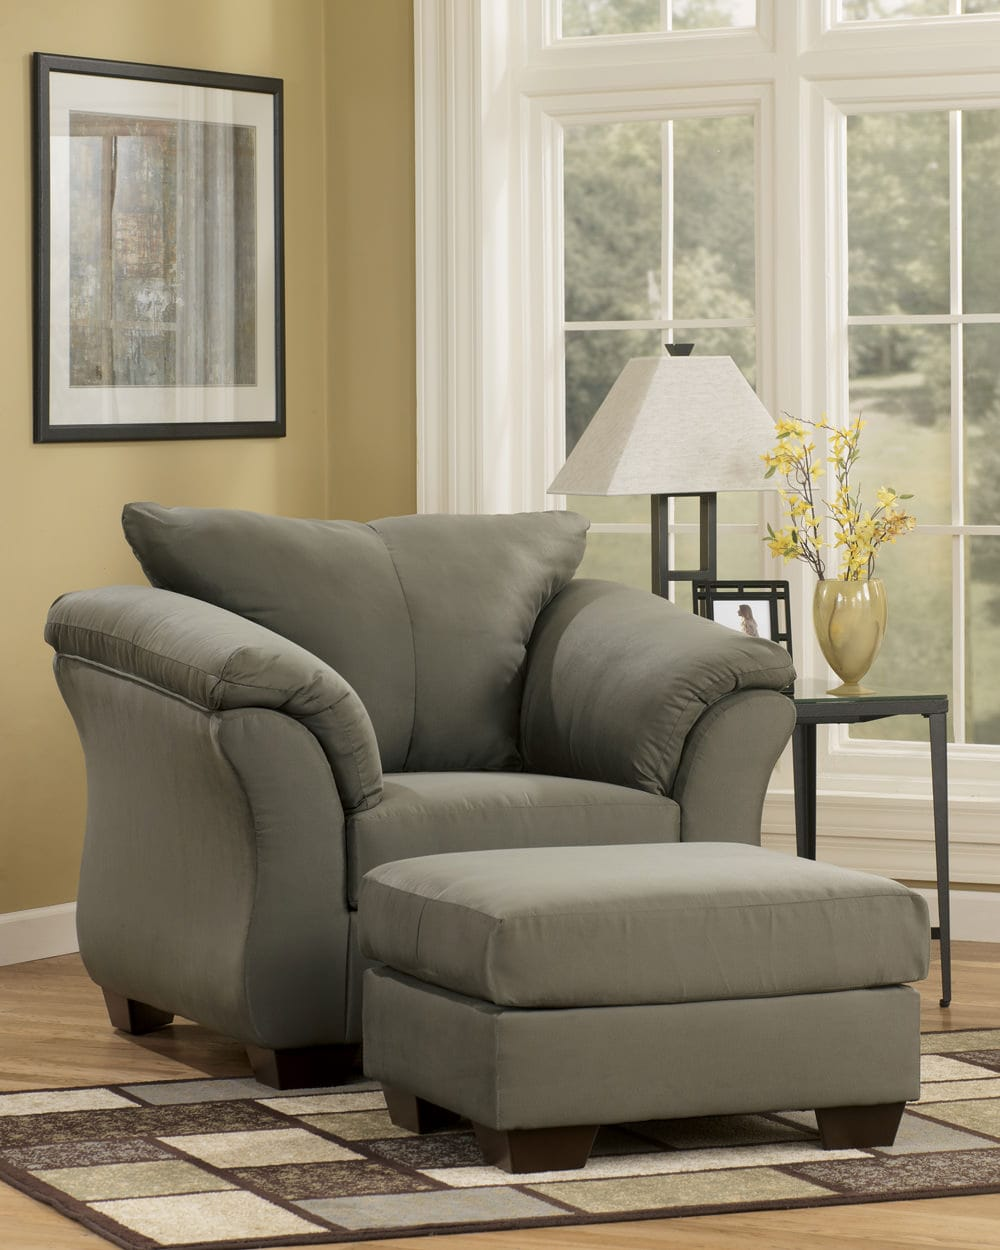 Ashley Furniture Leather Chairs #19: Futonland